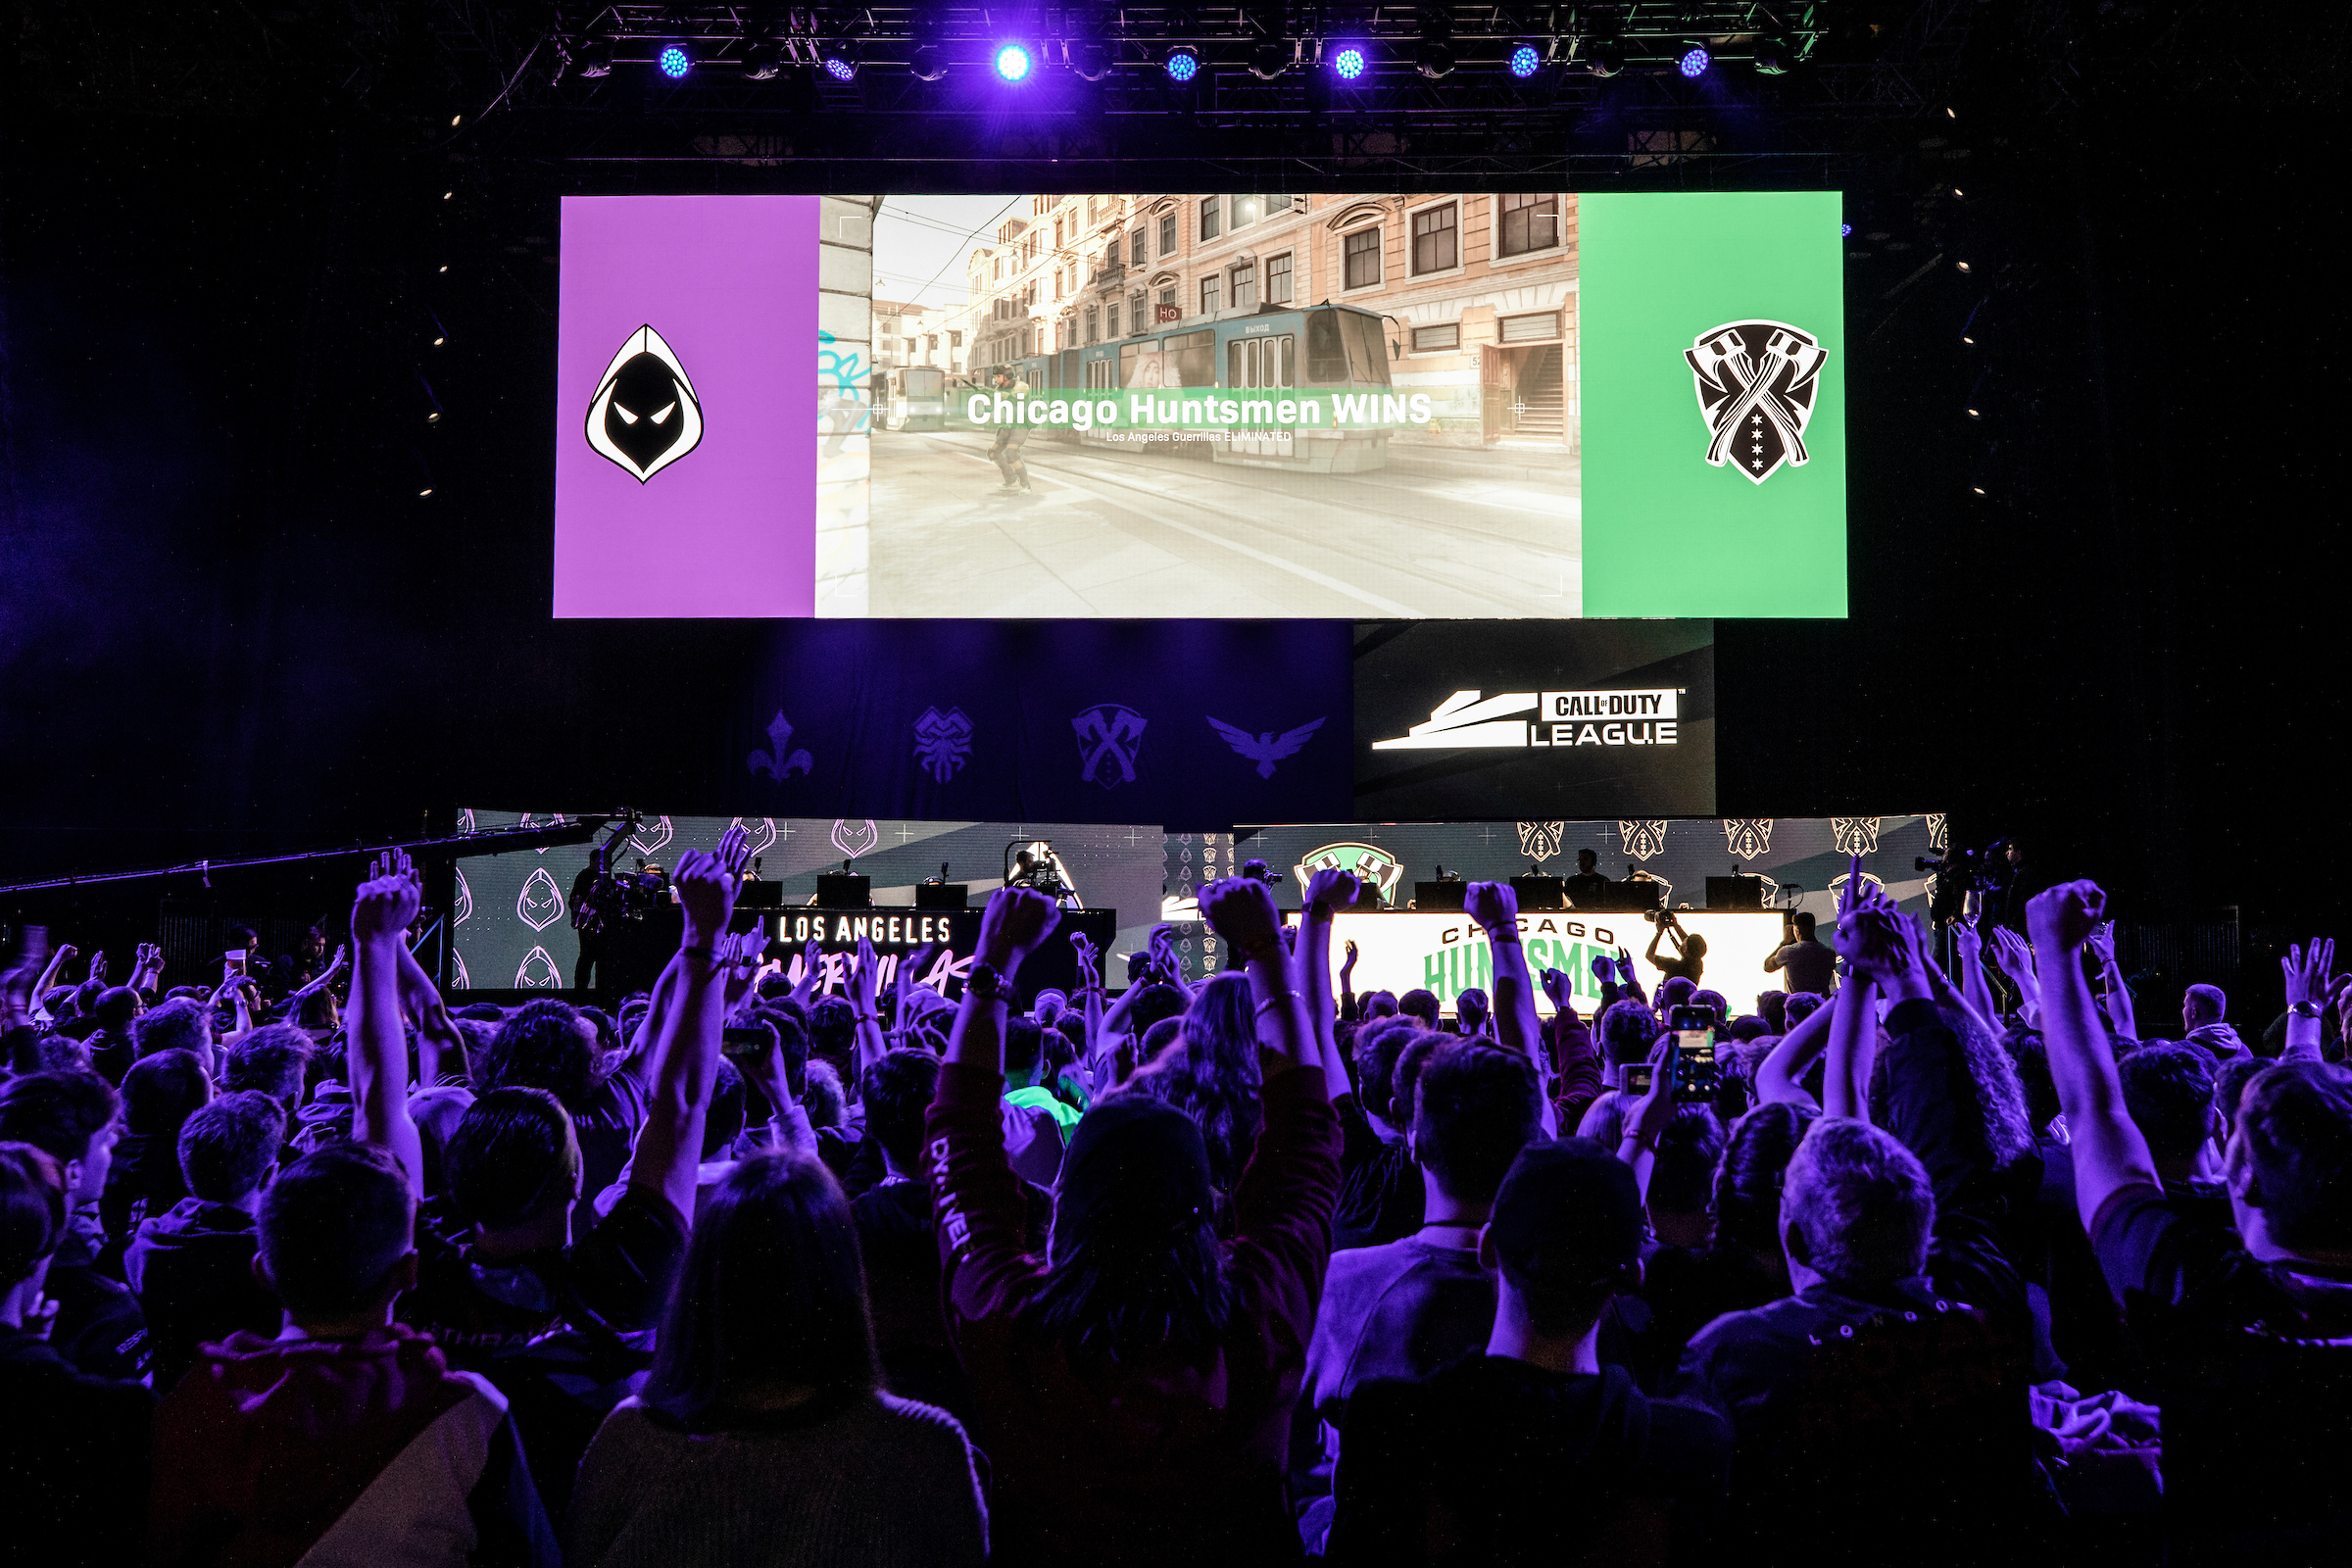 Los Angeles Guerrillas Bring Back Bevils Ricky For 2021 Call Of Duty League Season Dot Esports